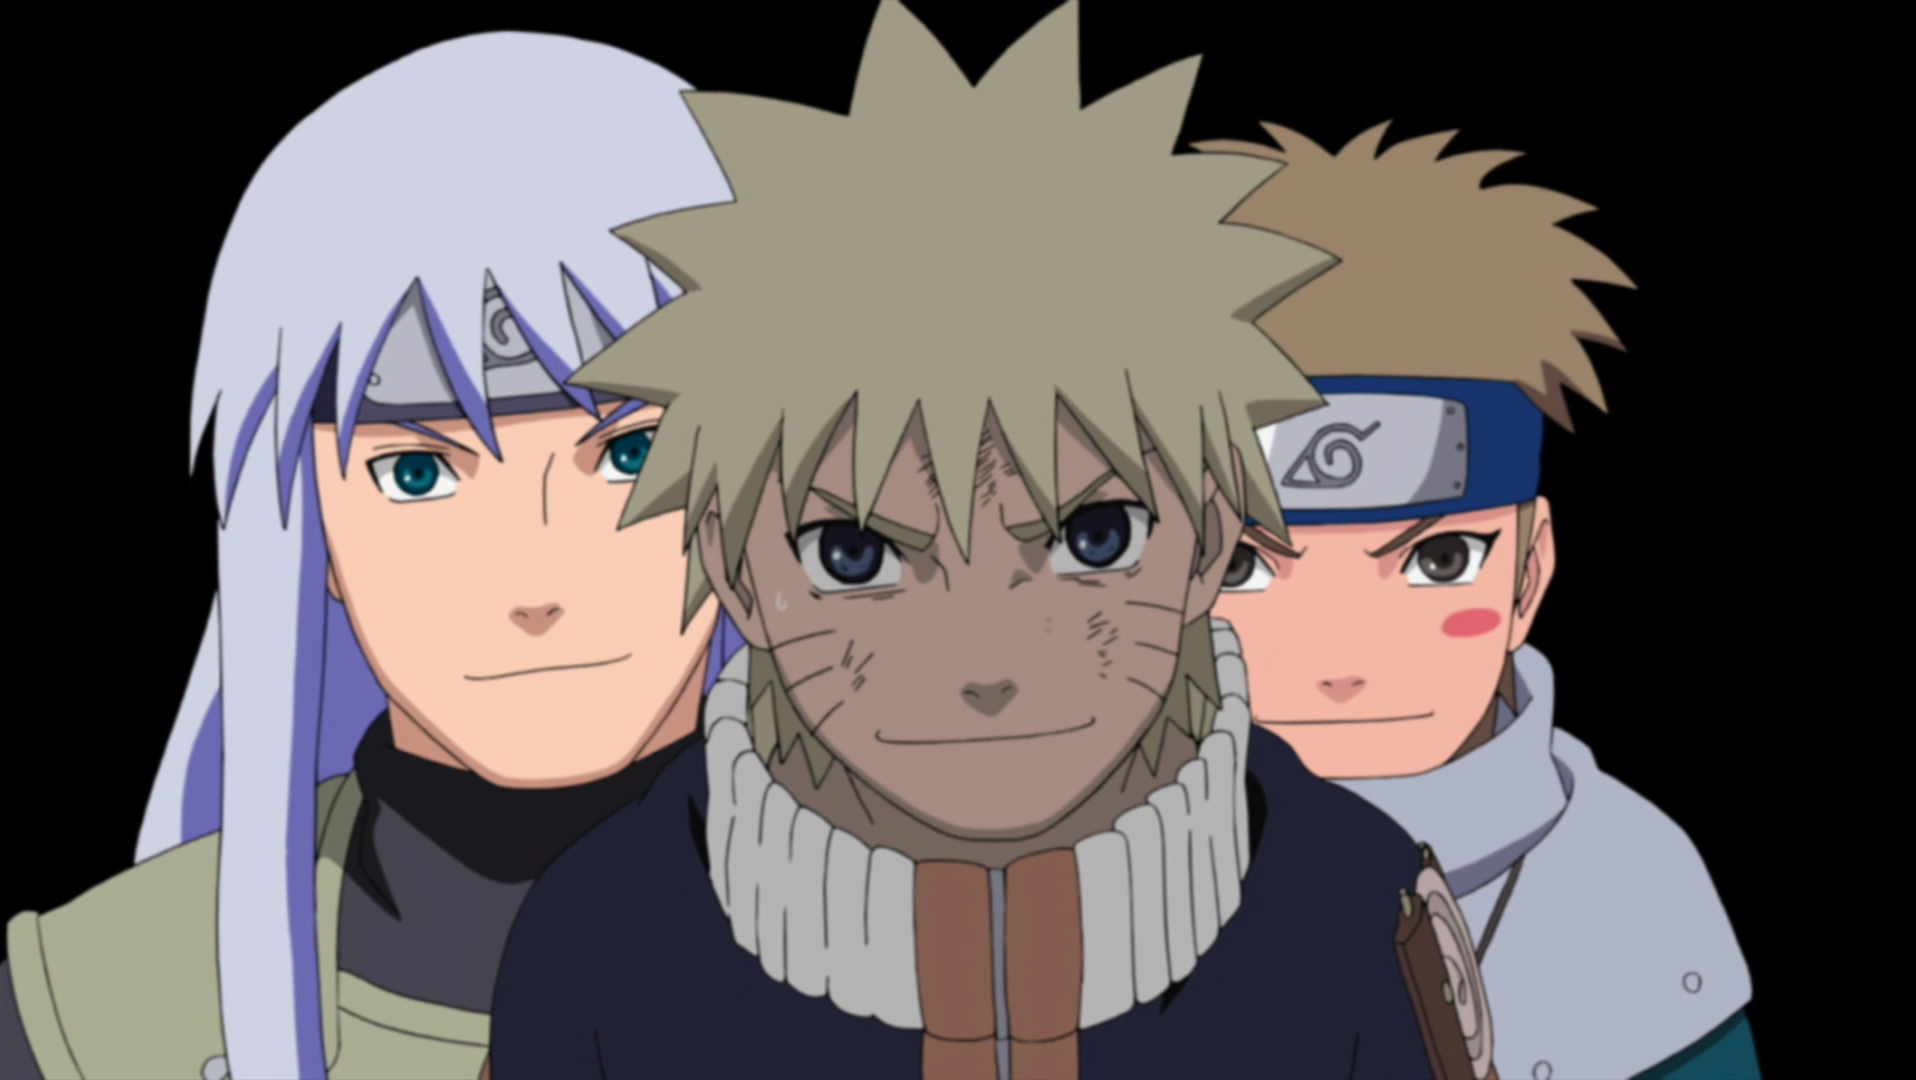 Naruto shippuden episode one worth betting on group round betting